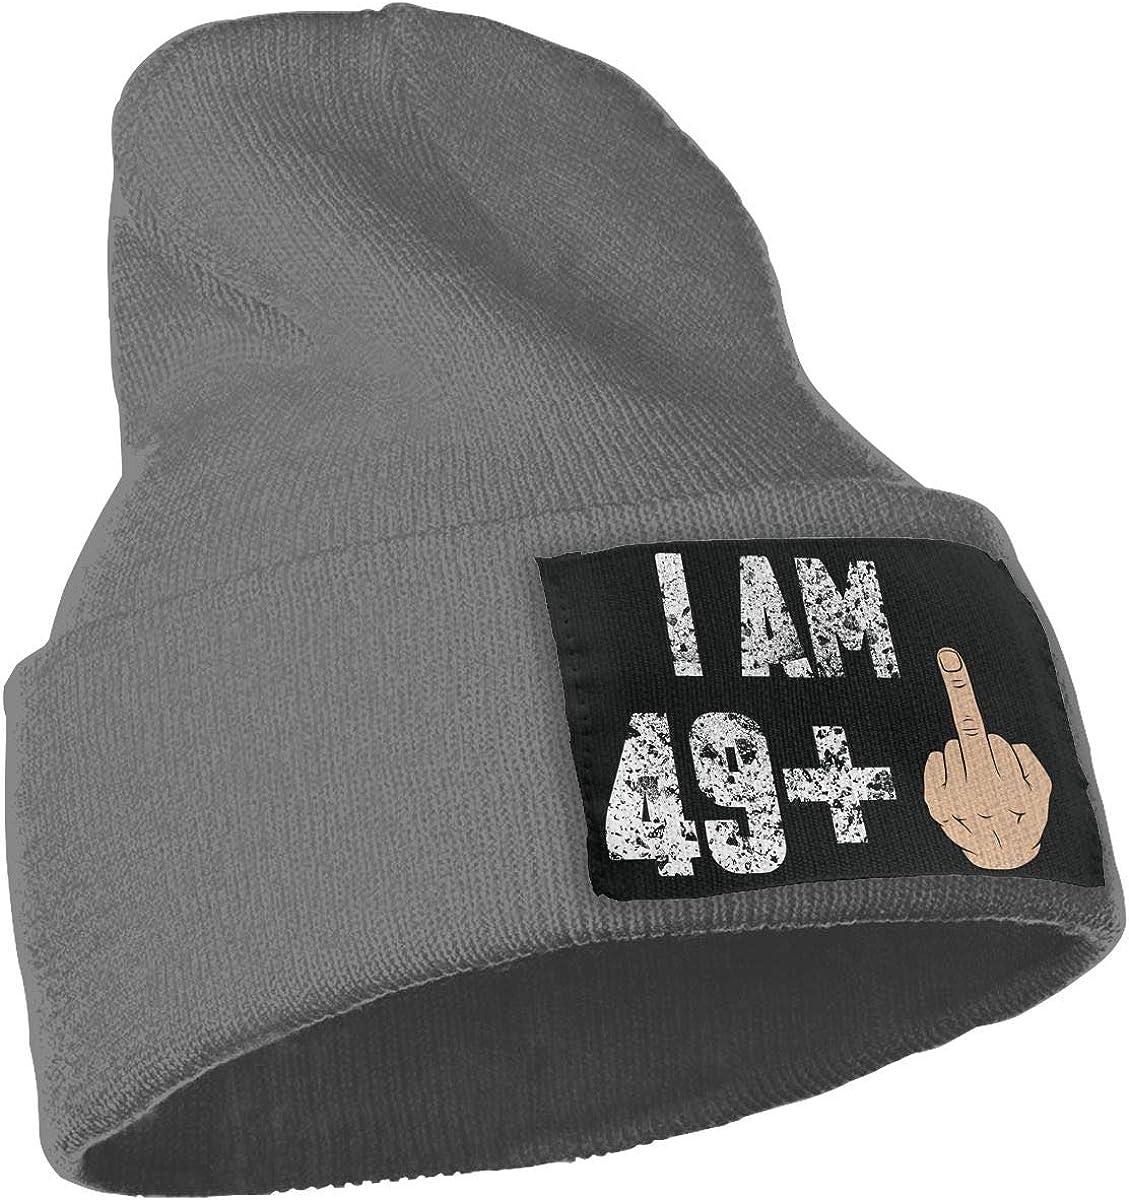 50th Birthday Gift Idea Warm Winter Hat Knit Beanie Skull Cap Cuff Beanie Hat Winter Hats for Men /& Women